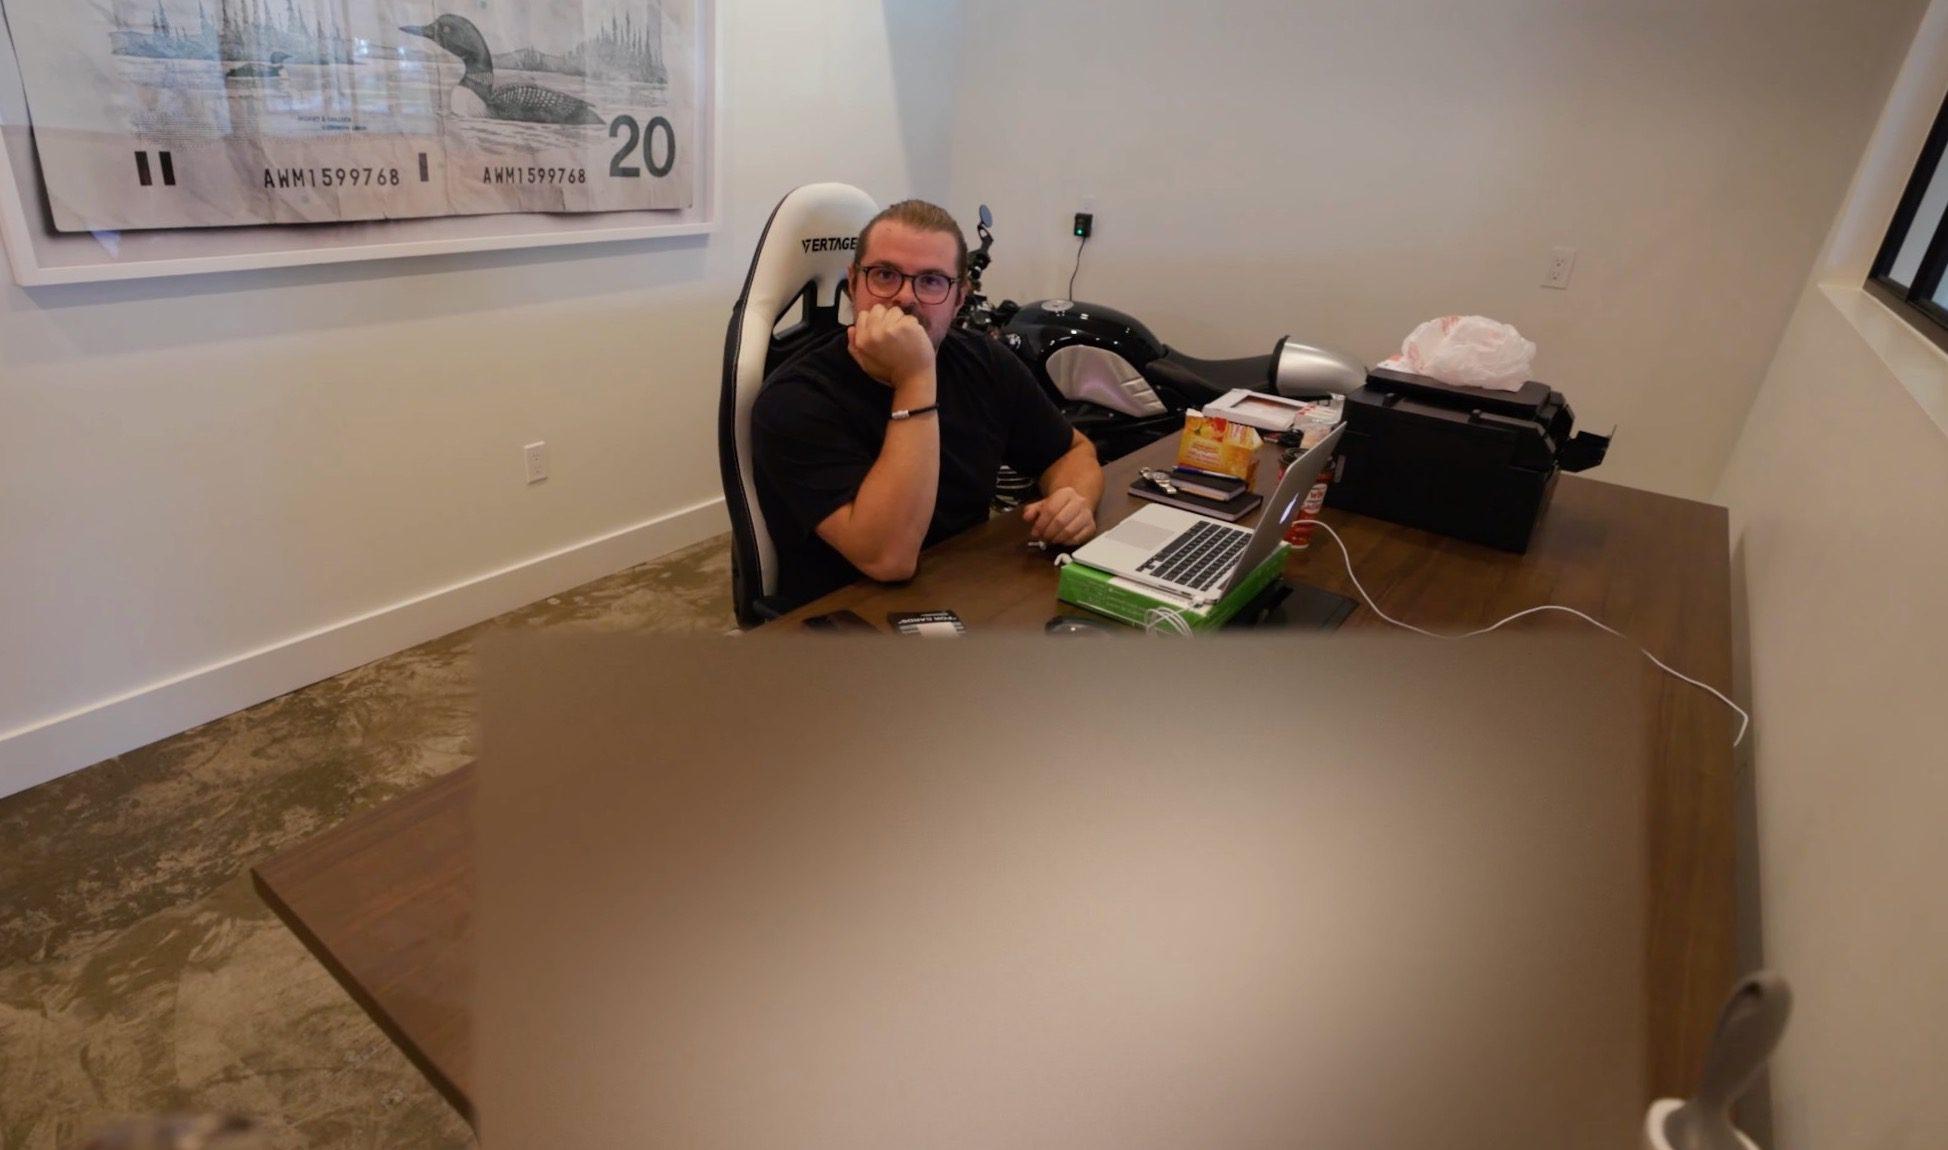 Peter McKinnon 不小心展示了 DJI Action 2 相机